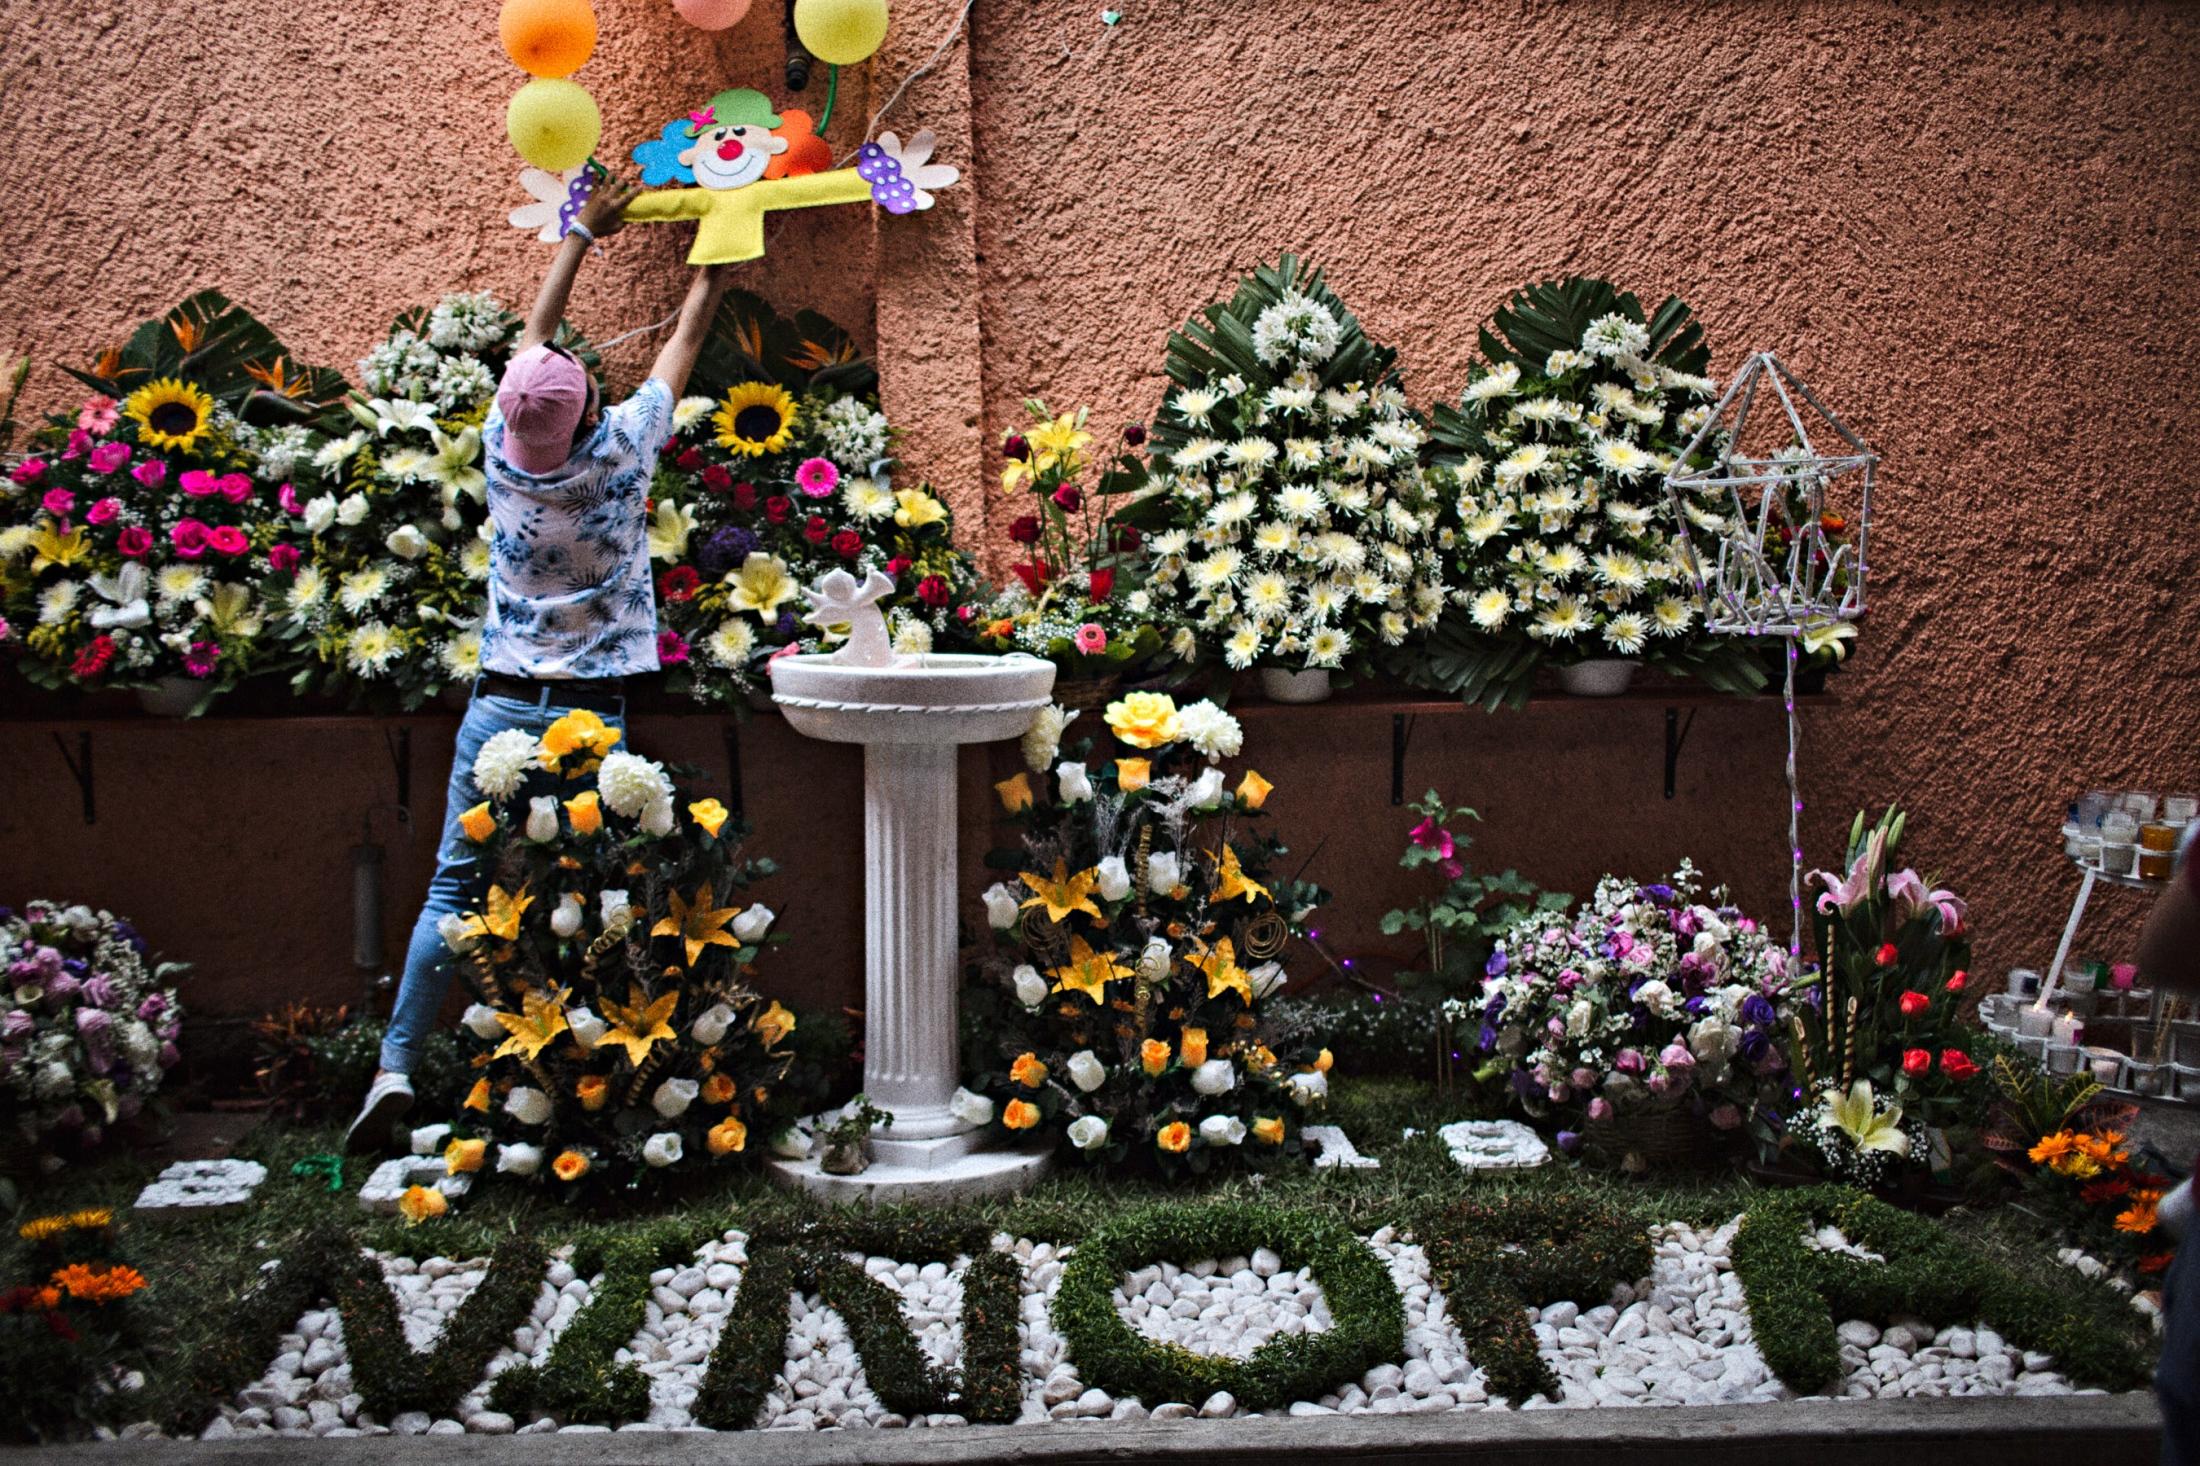 A boy places some balloons on the wall above a garden specially made for Niñopa.